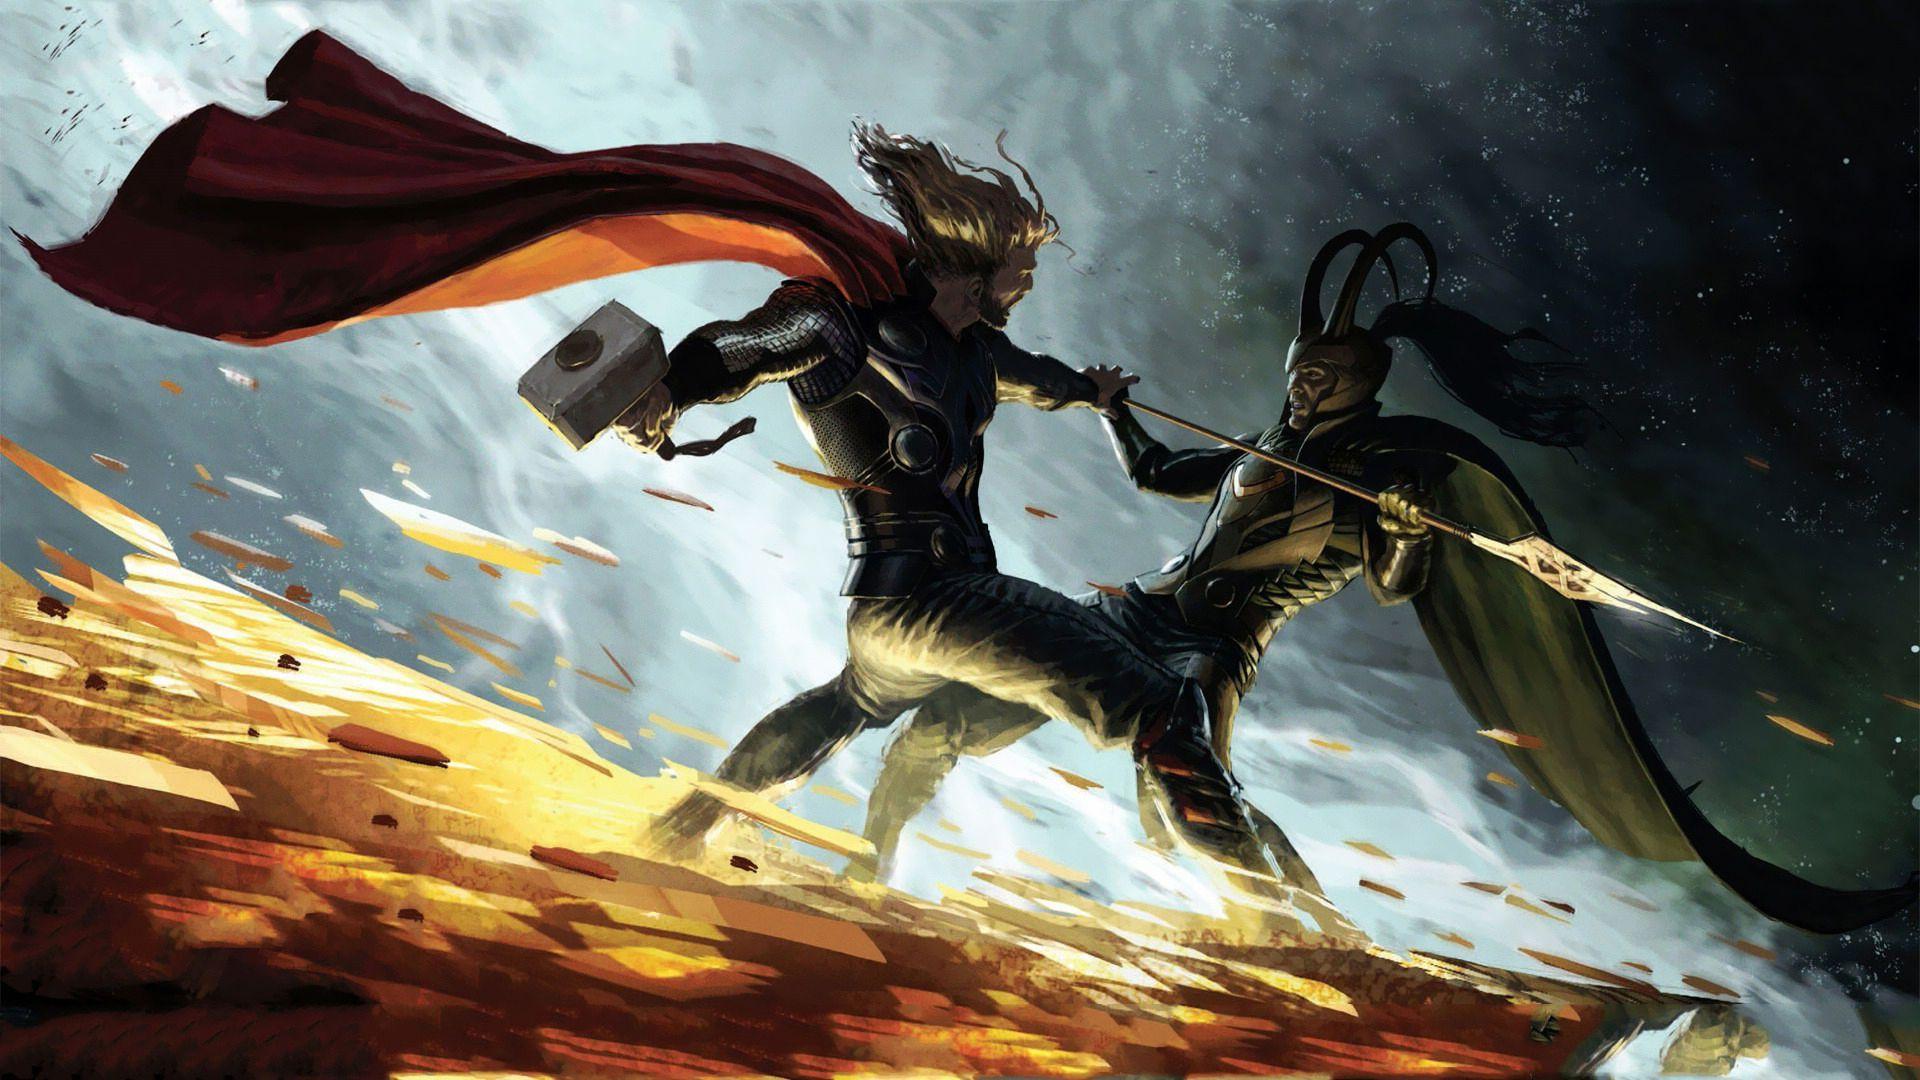 Thor versus Loki